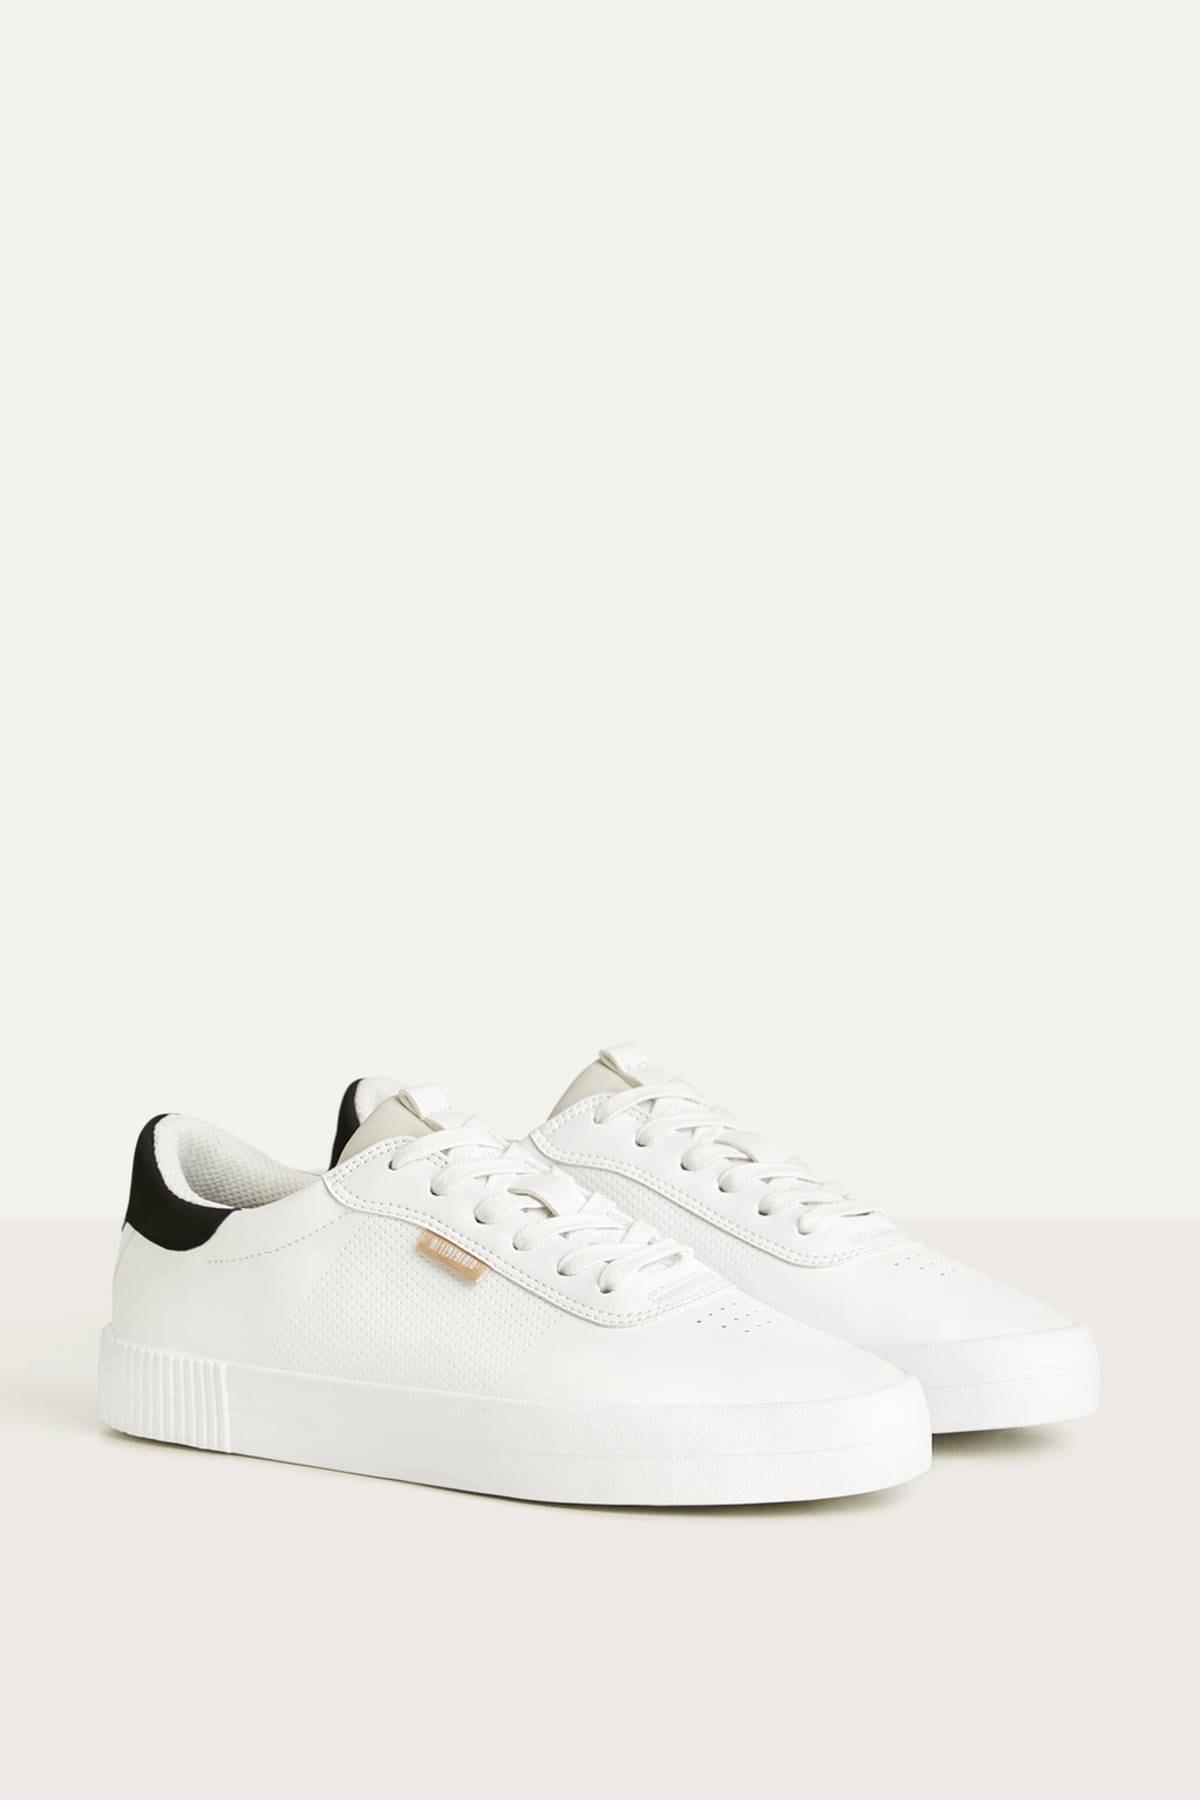 خرید کفش اسپرت مردانه ترک جدید مارک bershka کد ty40975451